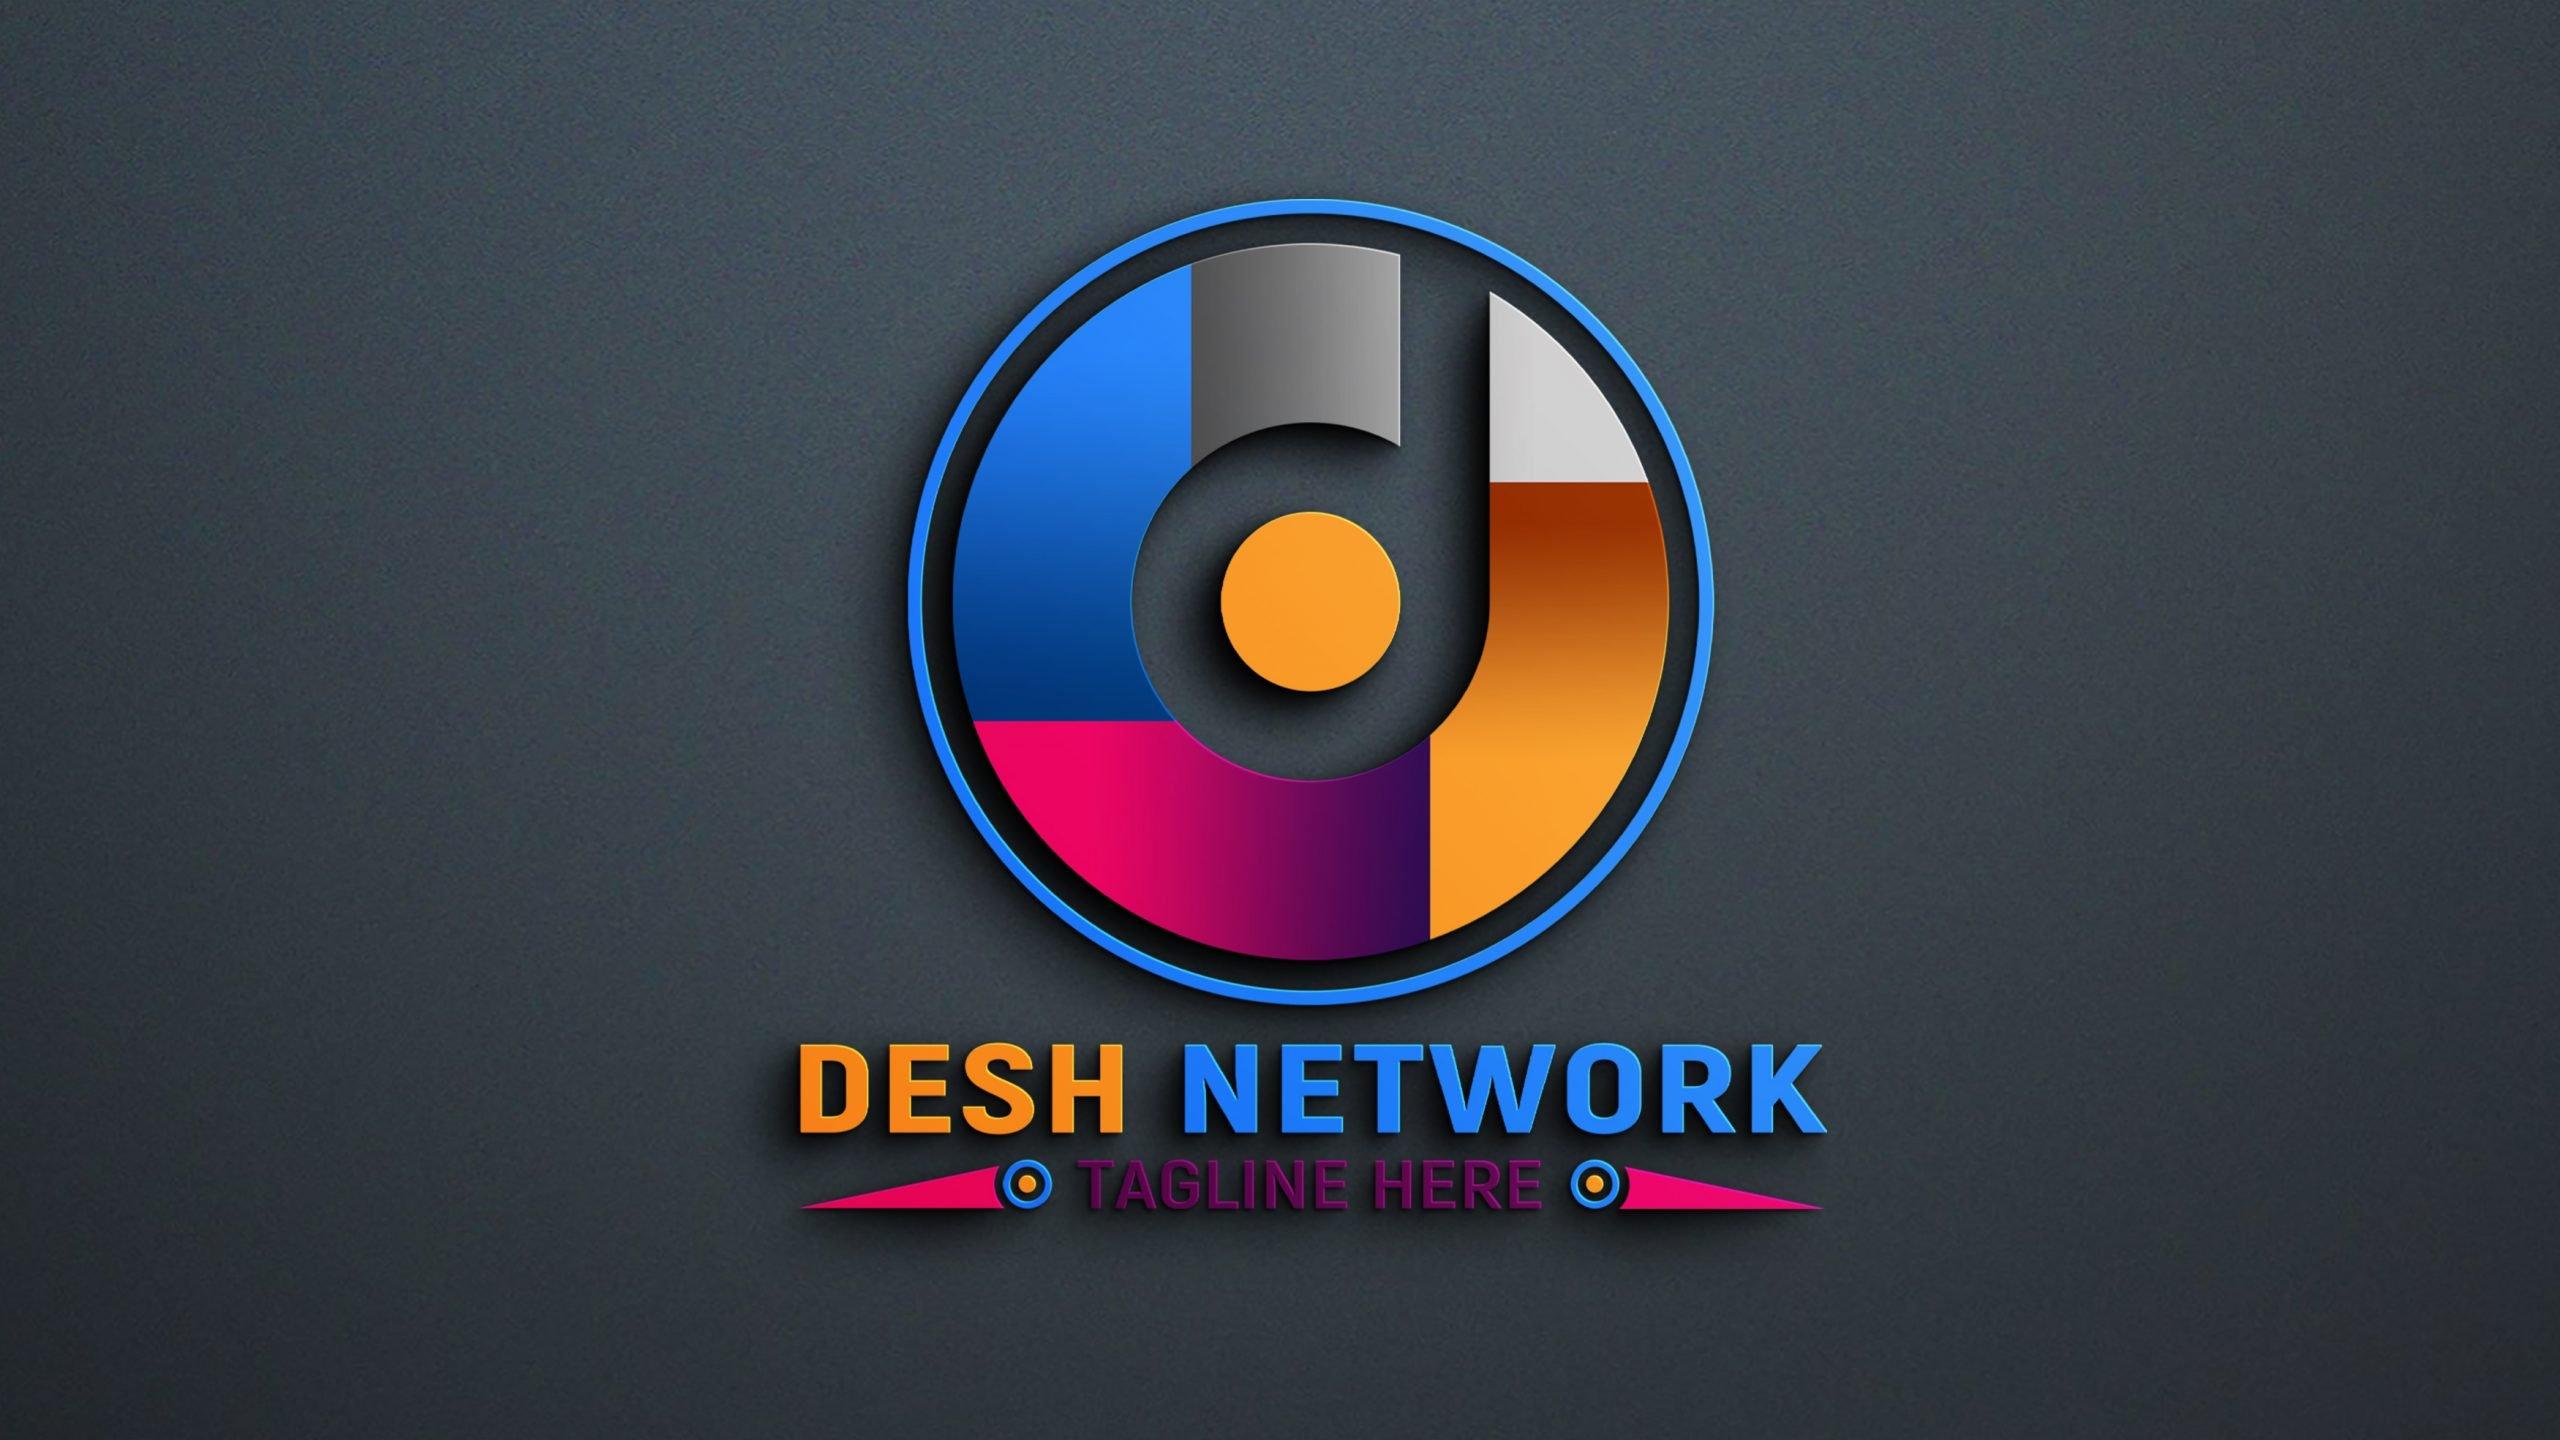 Editable Network Logo Design Download